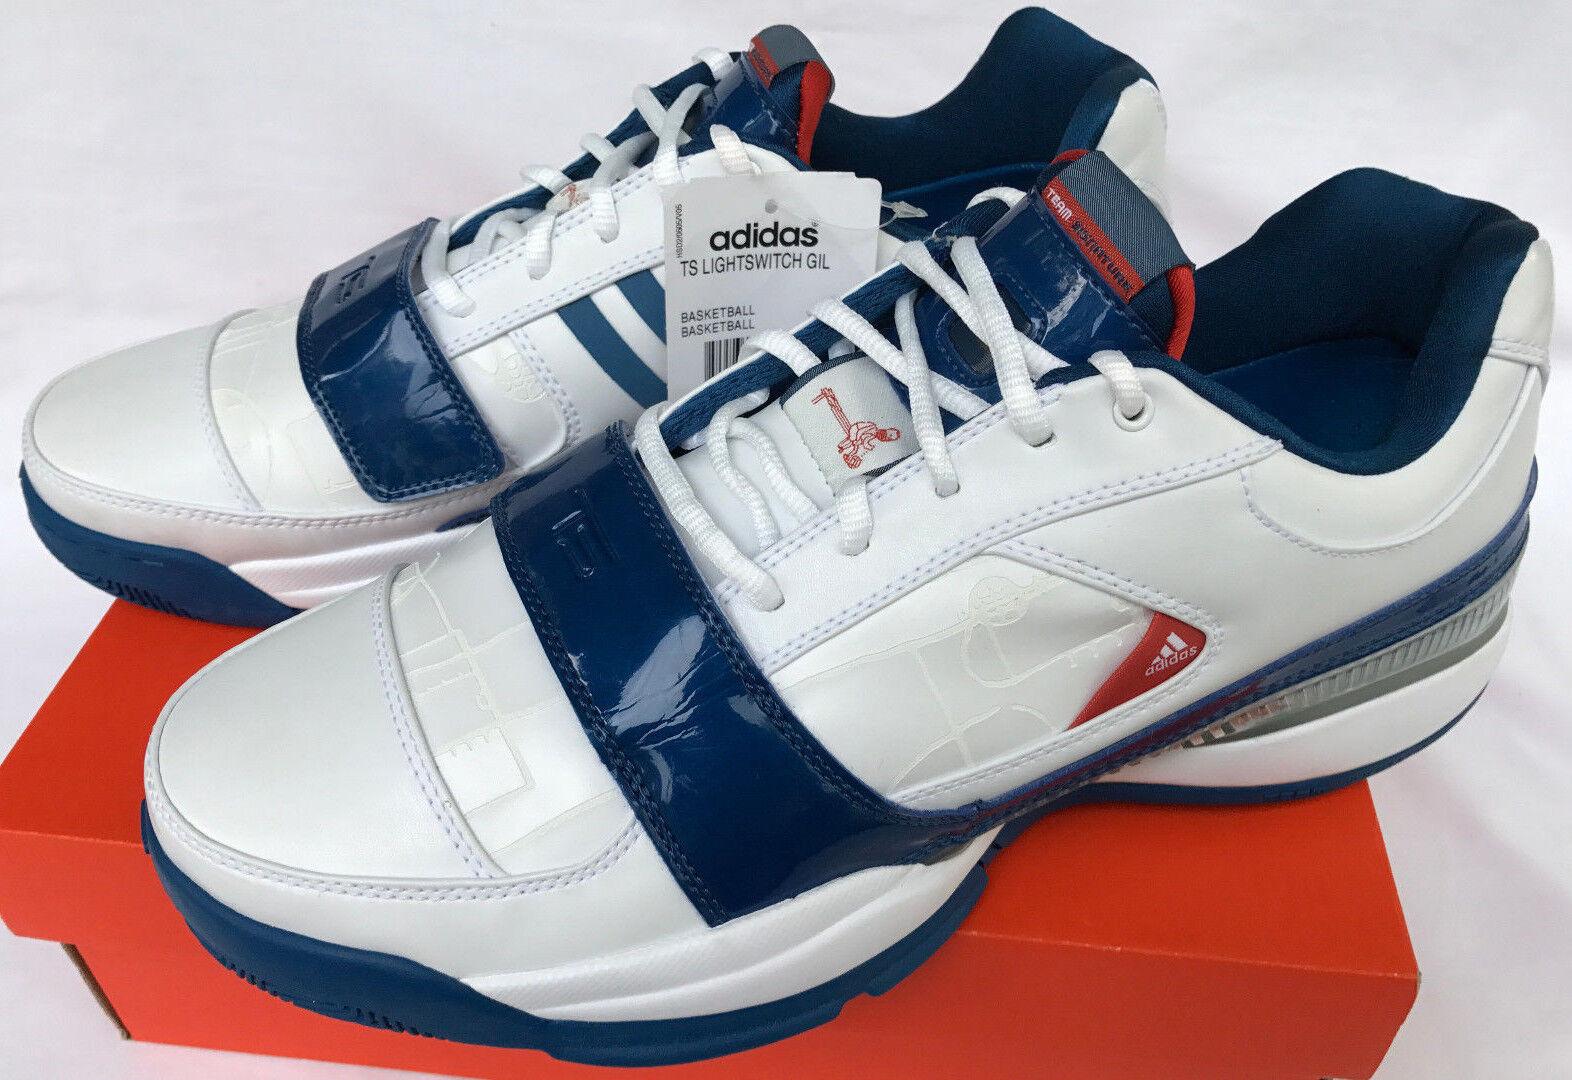 Adidas TS Lightswitch Gil 061790 Gilbert Arenas Wht Basketball Shoes Men's 11.5